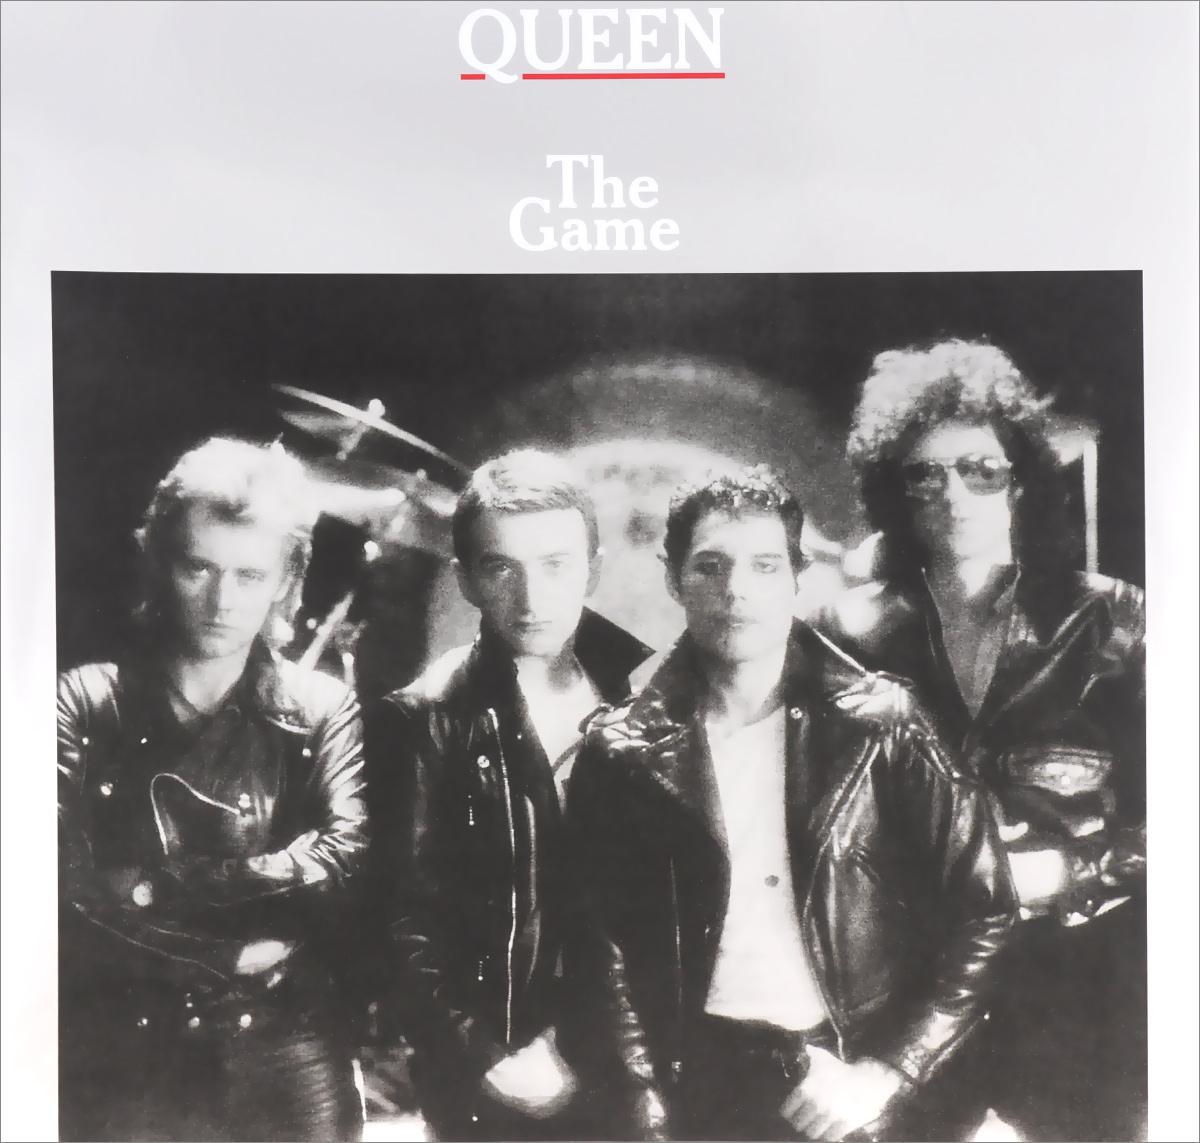 Queen Queen. The Game (LP) queen queen queen lp